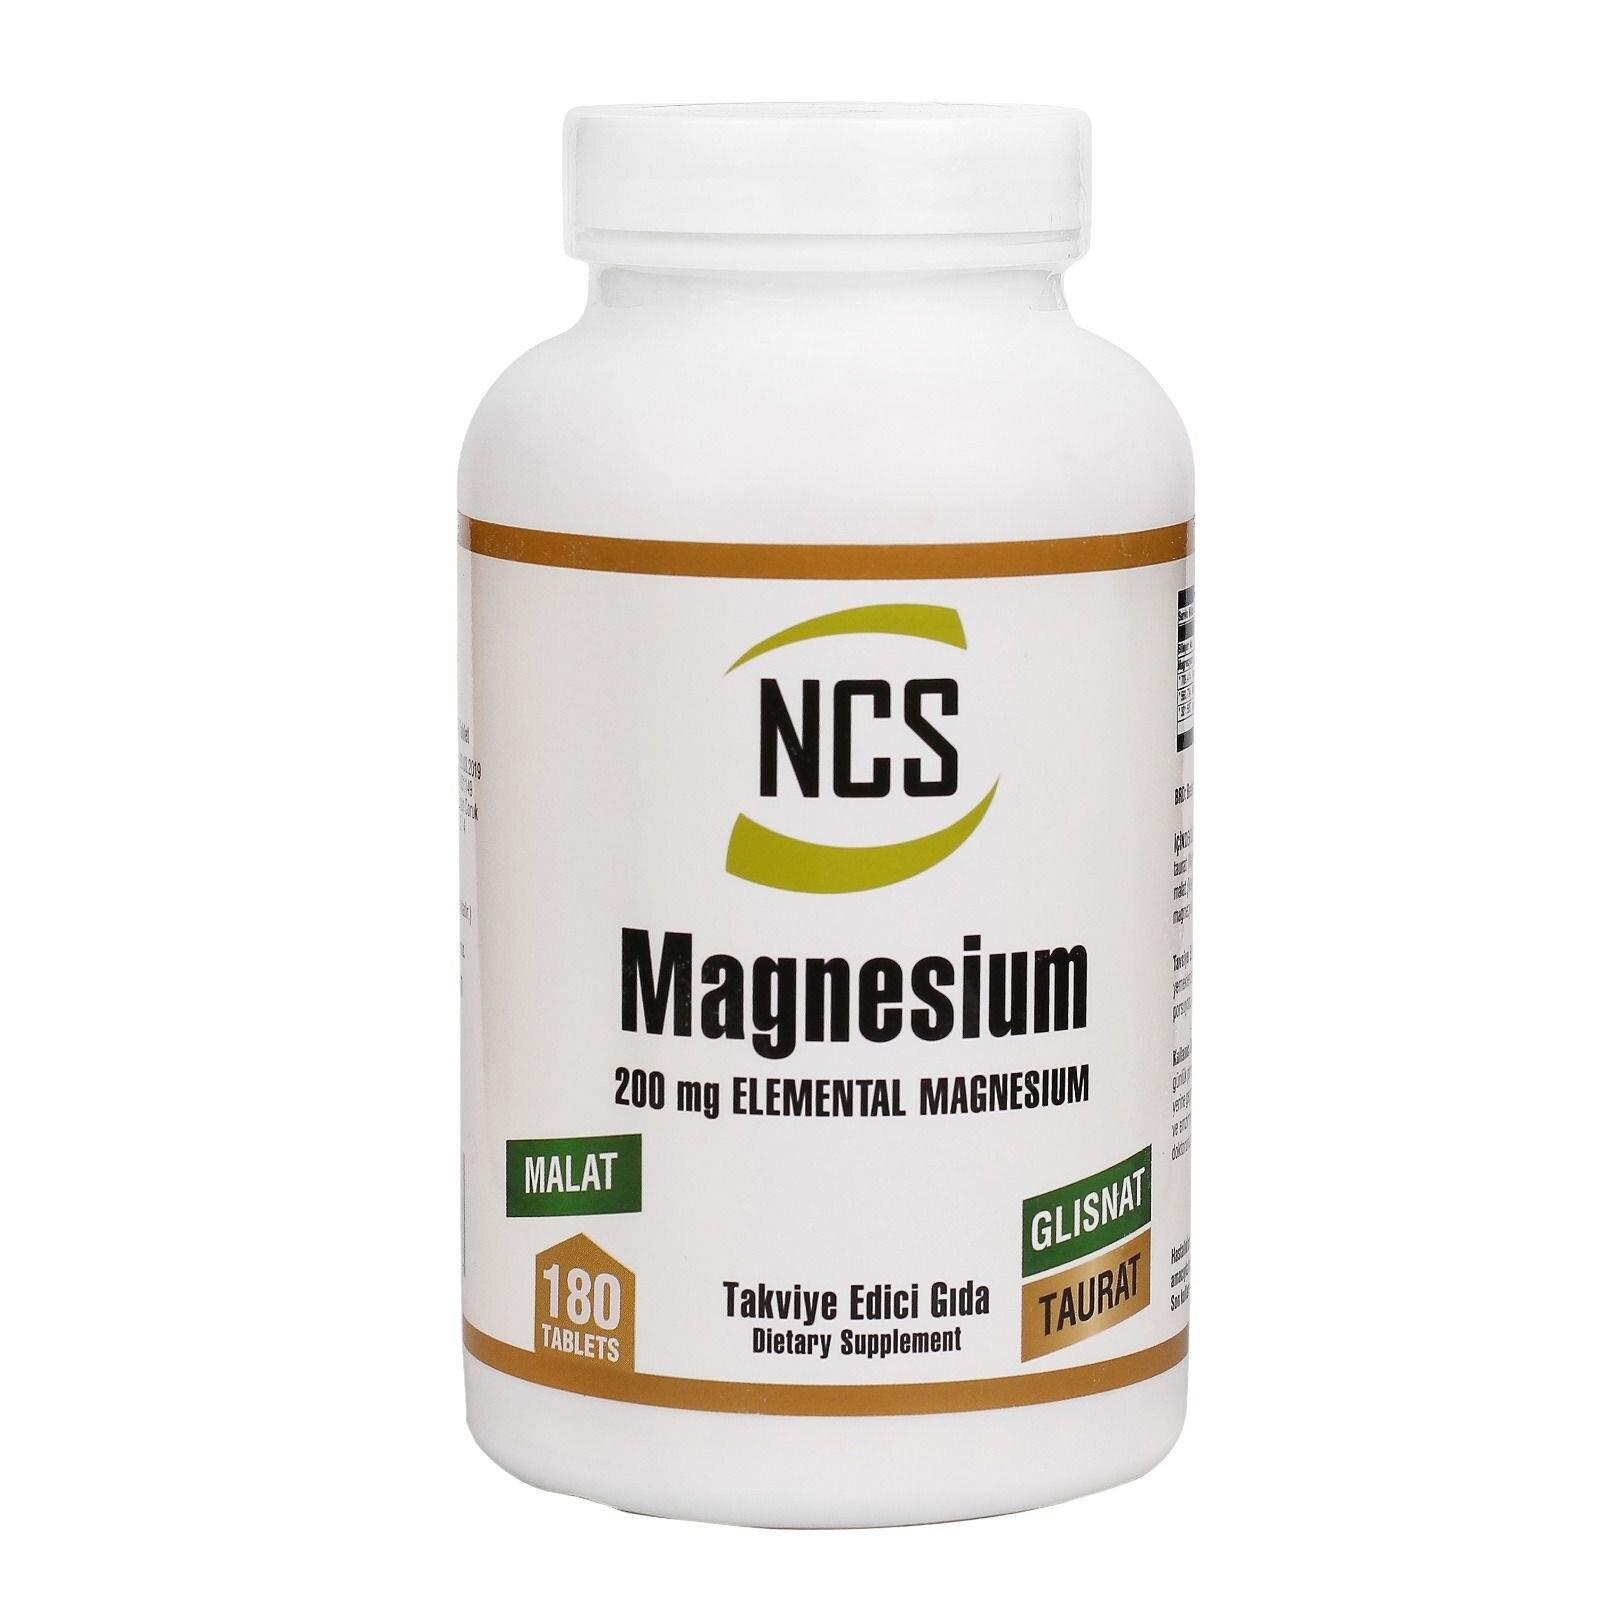 Ncs malato de magnesio Glisinat Torá 180 Tablet